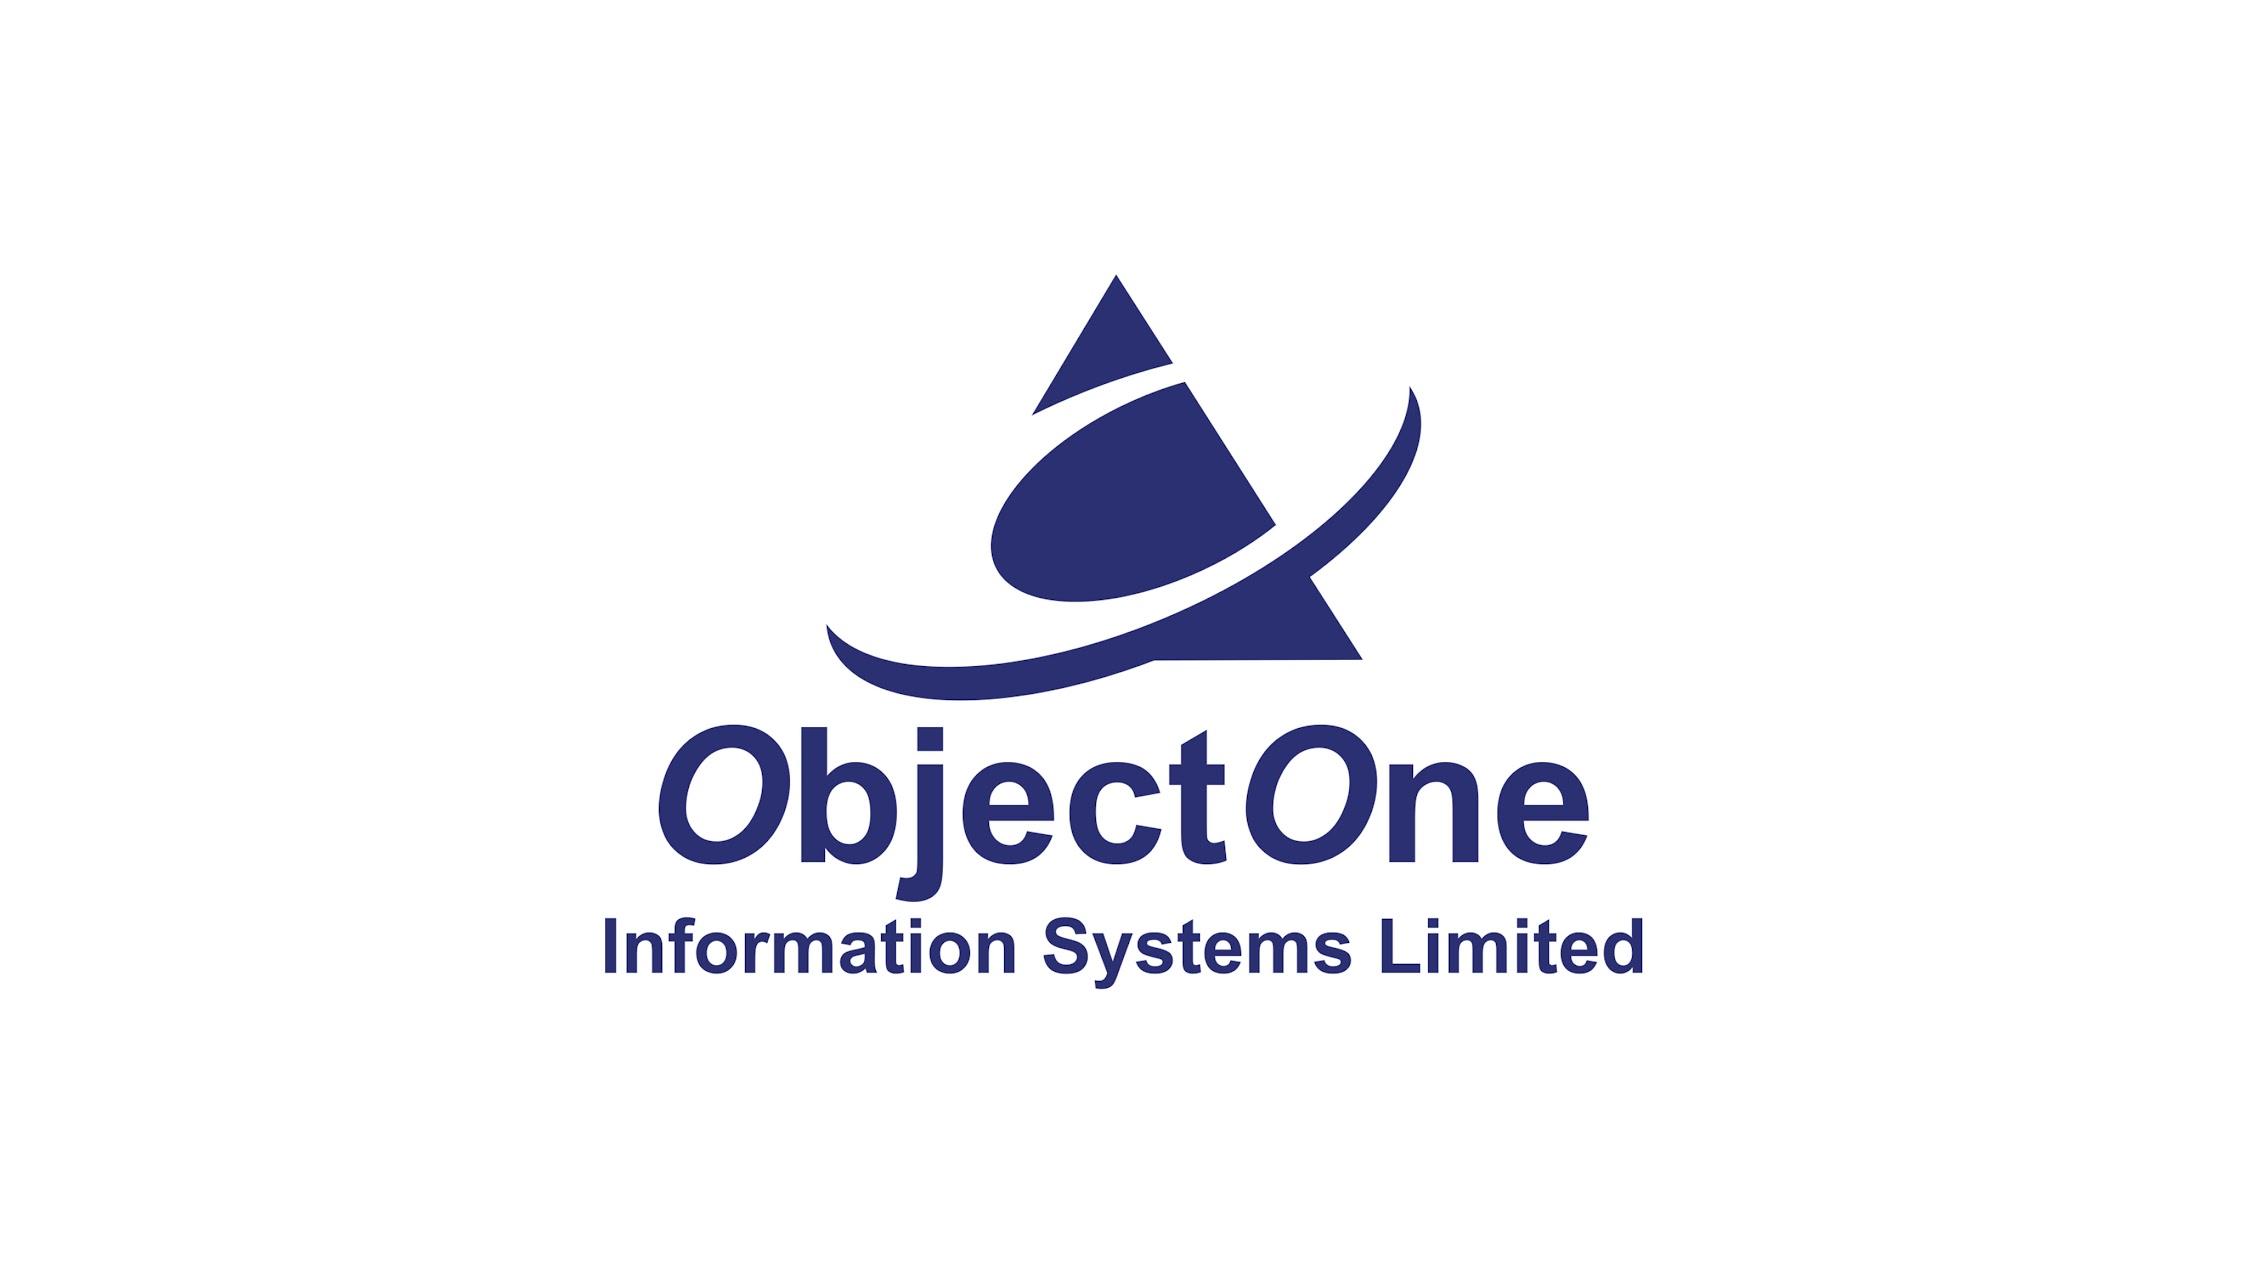 ObjectOne